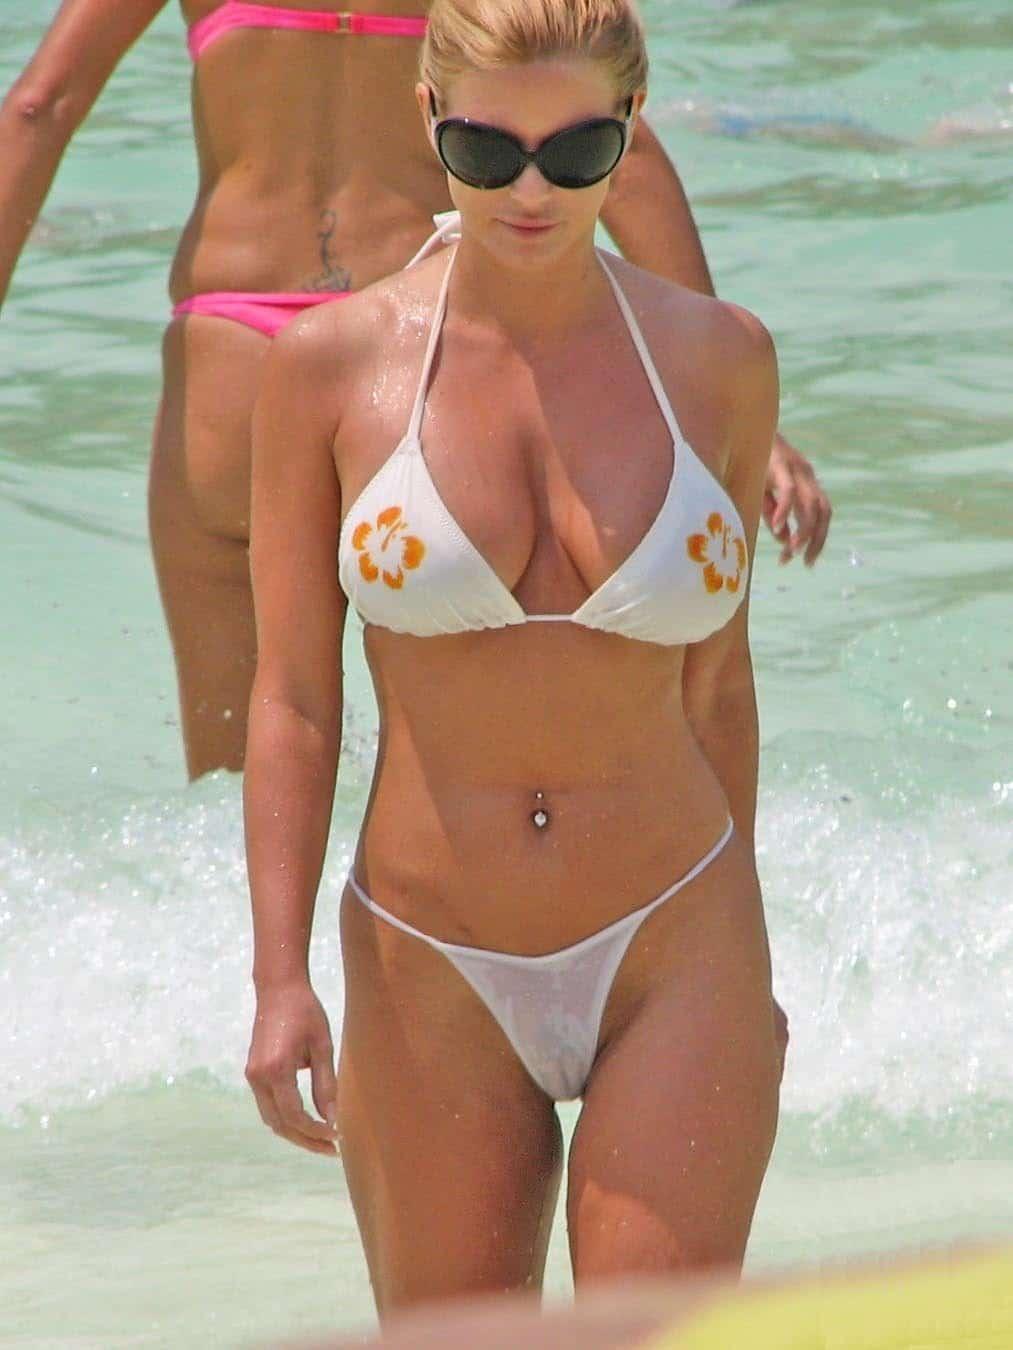 Jessica Simpson nsfw nudes